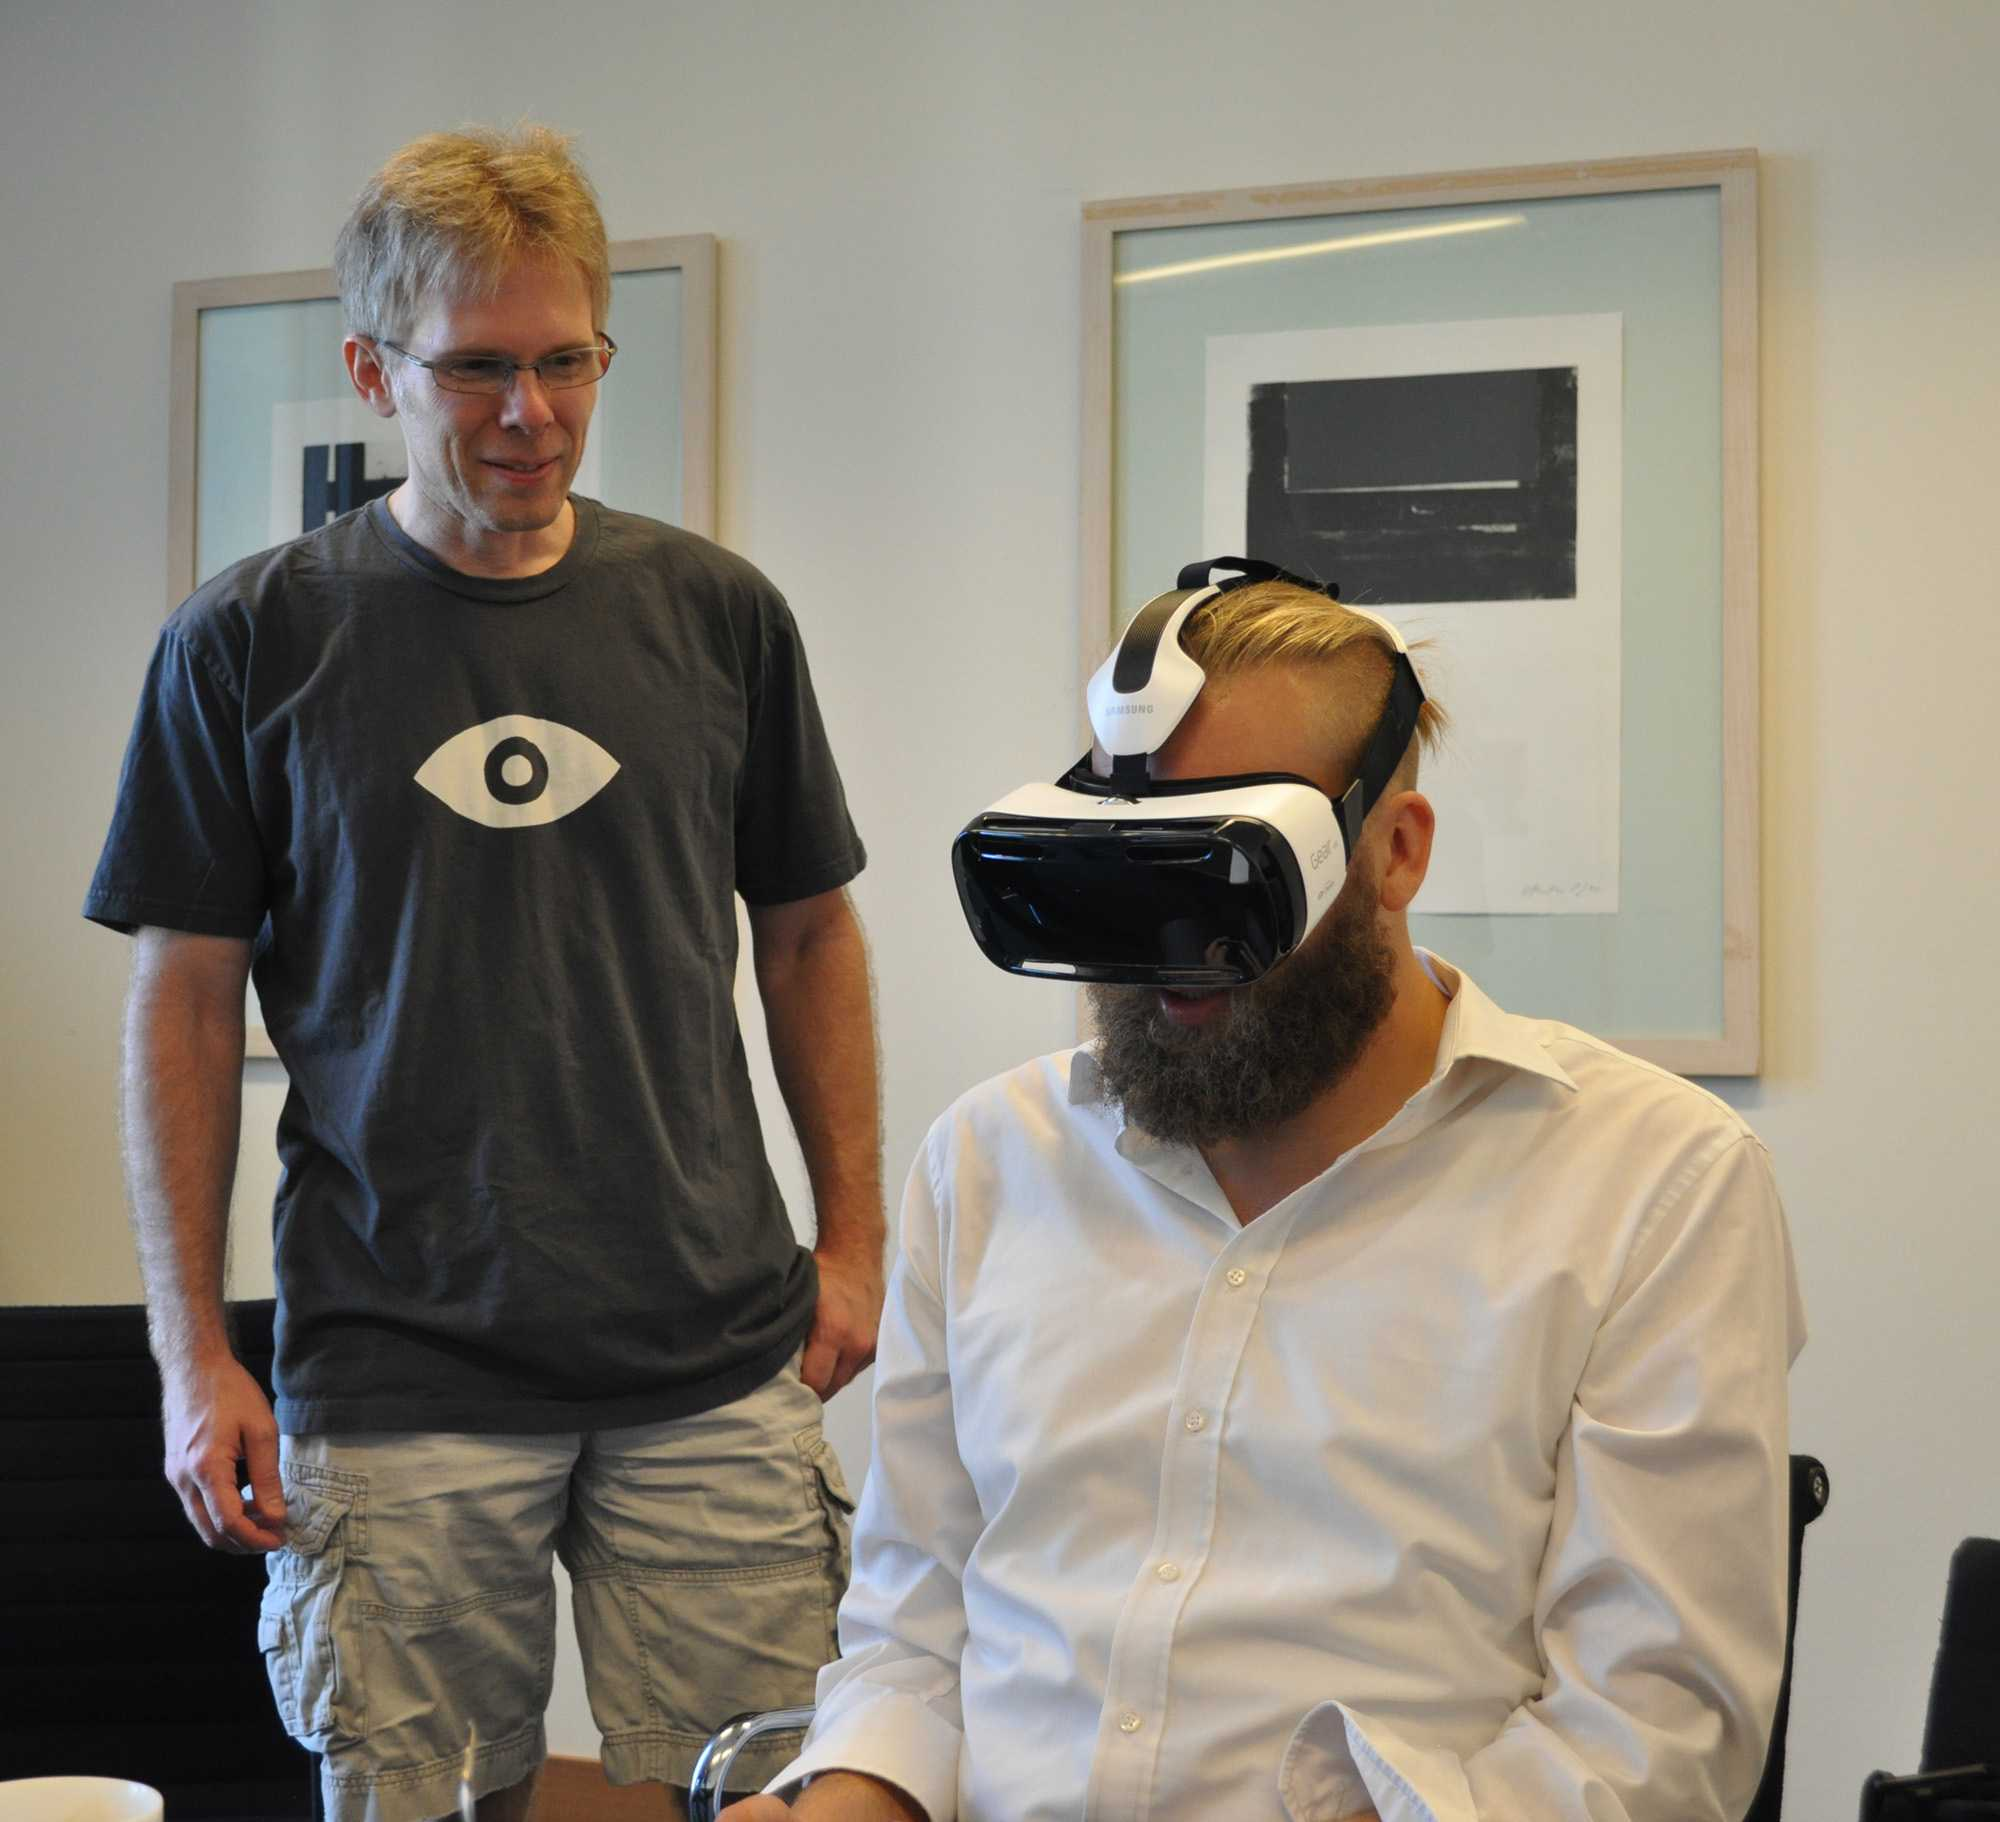 Hands-on VR Gear: John Carmack geht ins Detail